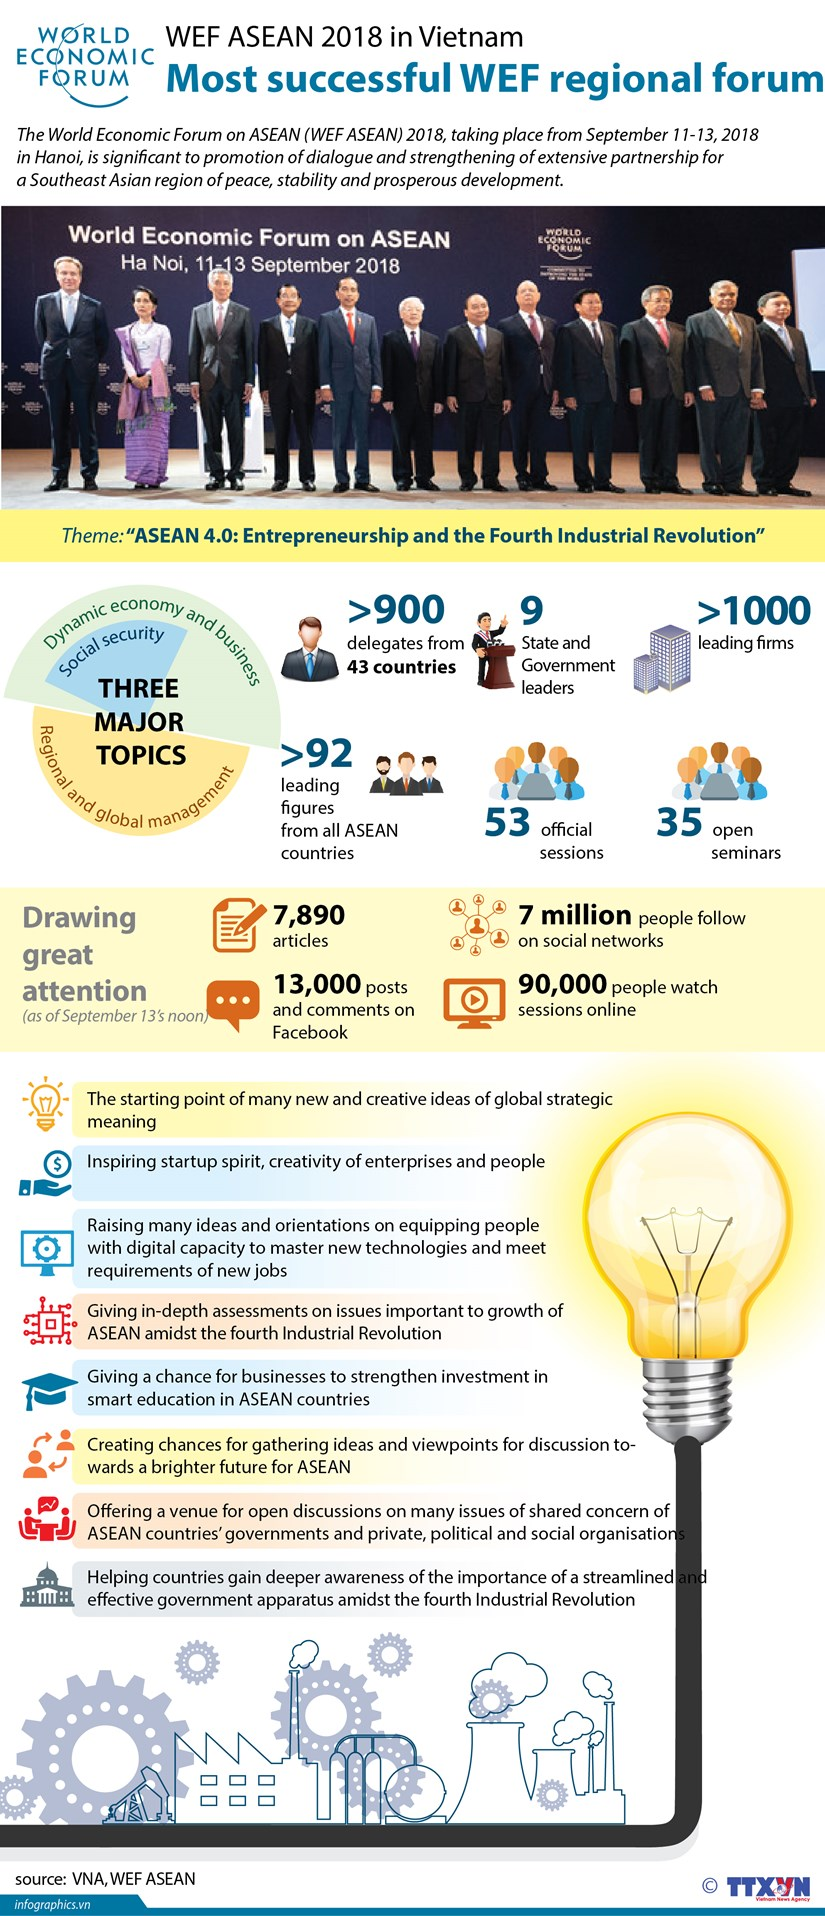 WEF ASEAN 2018 in Vietnam: Most successful WEF regional forum hinh anh 1